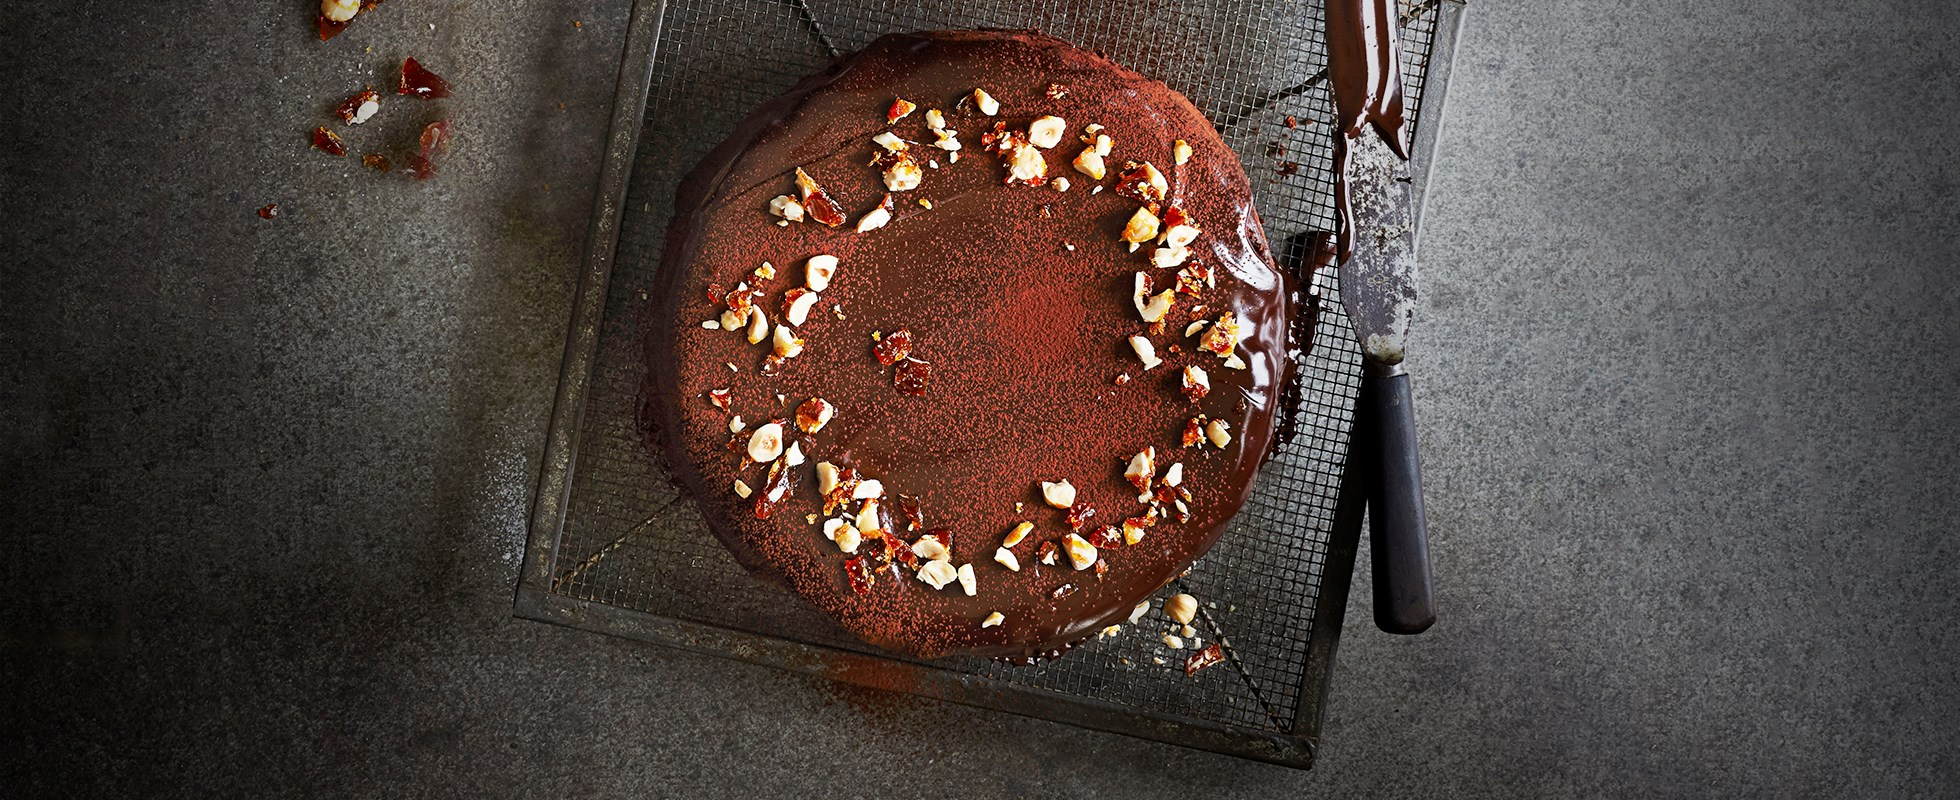 Chocolate hazelnut cake (torta alla nocciola)